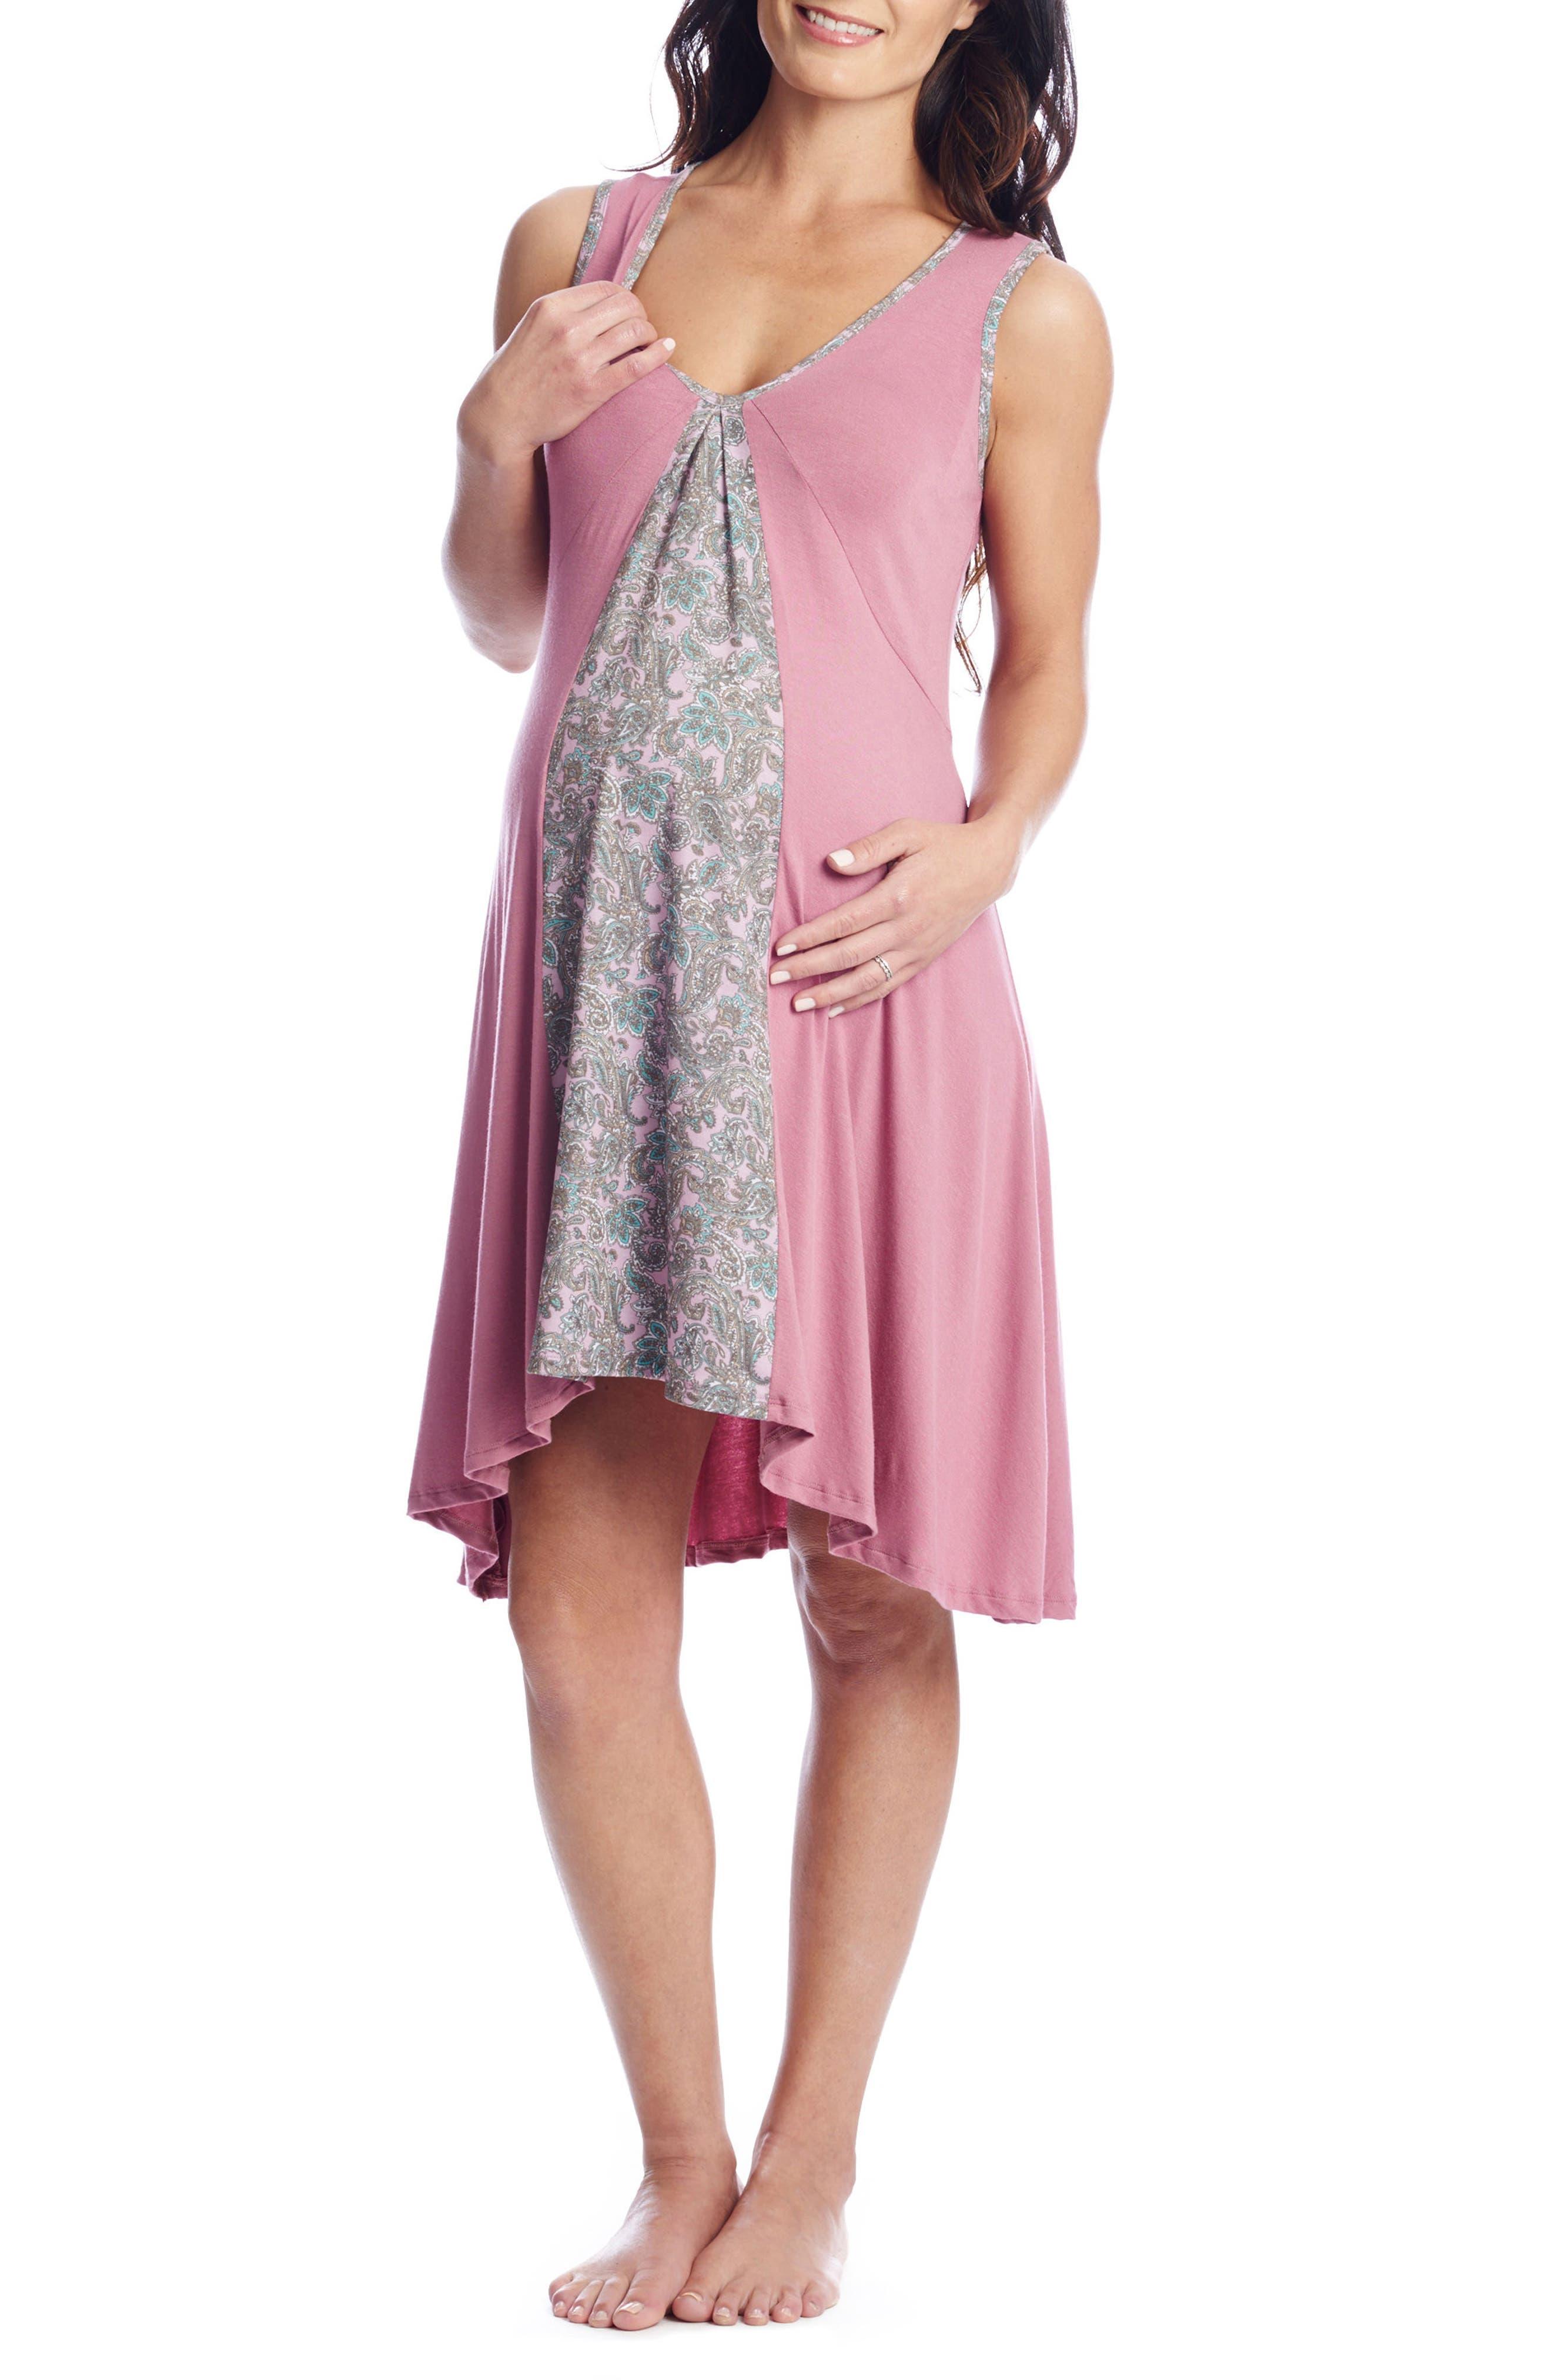 Alternate Image 1 Selected - Everly Grey Dawn 4-Piece Maternity/Nursing Pajama Set